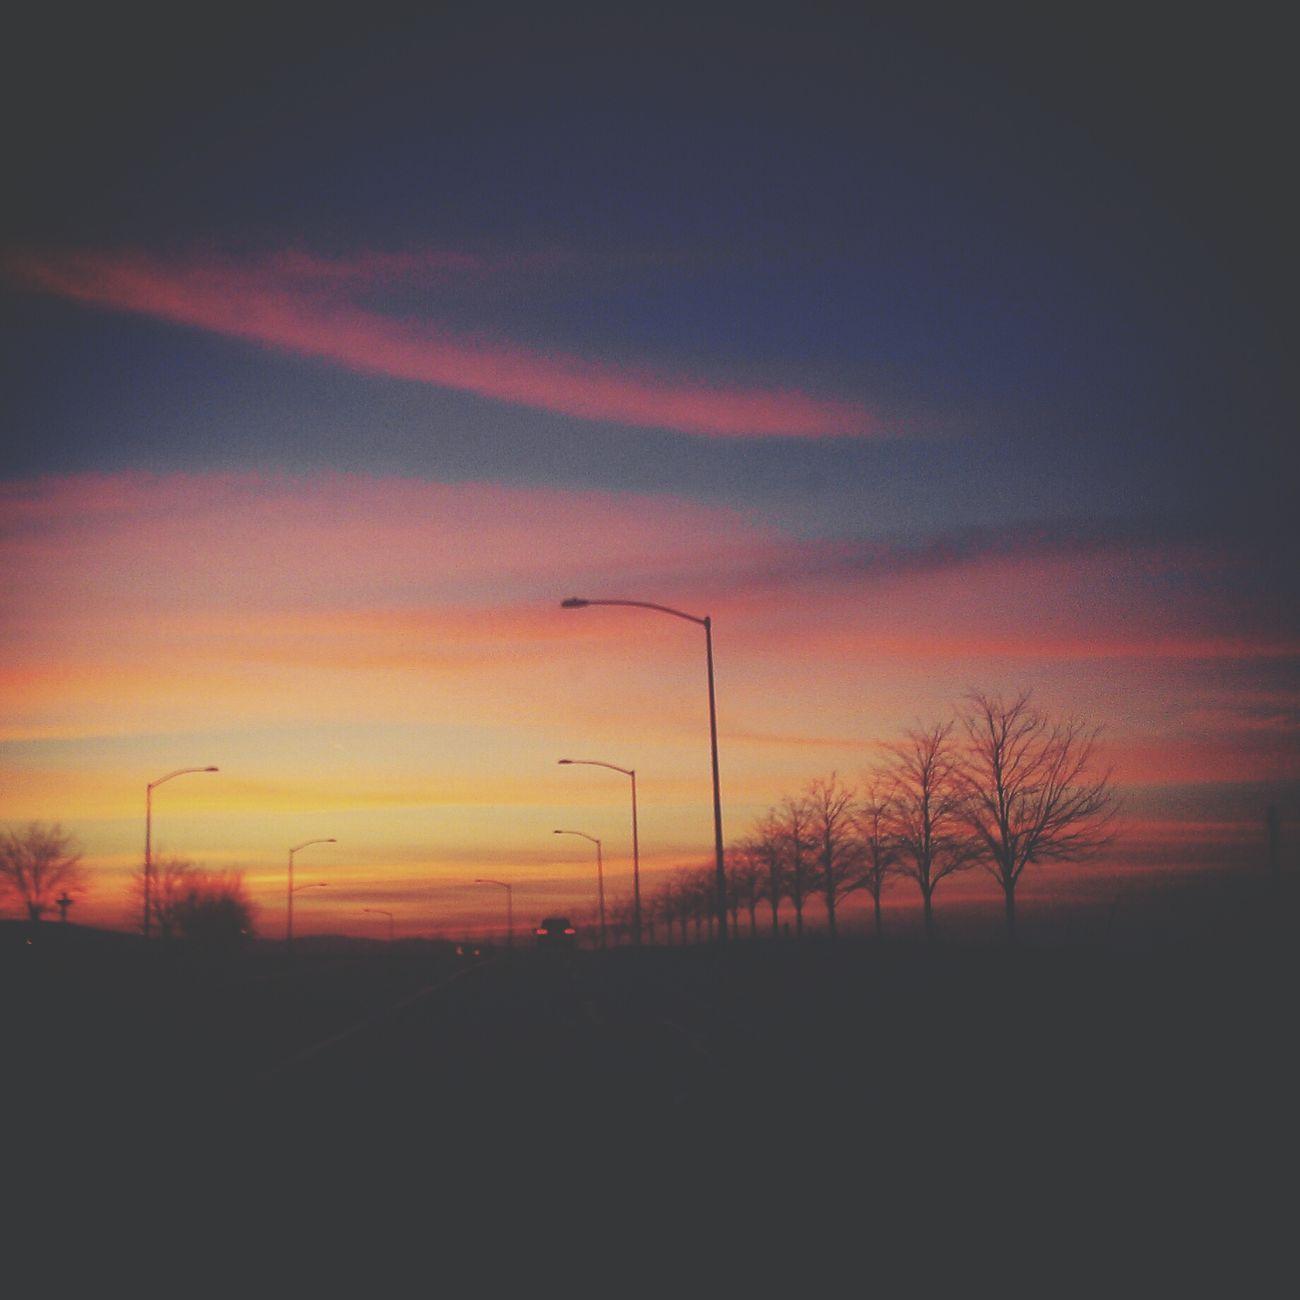 Sunsetporn